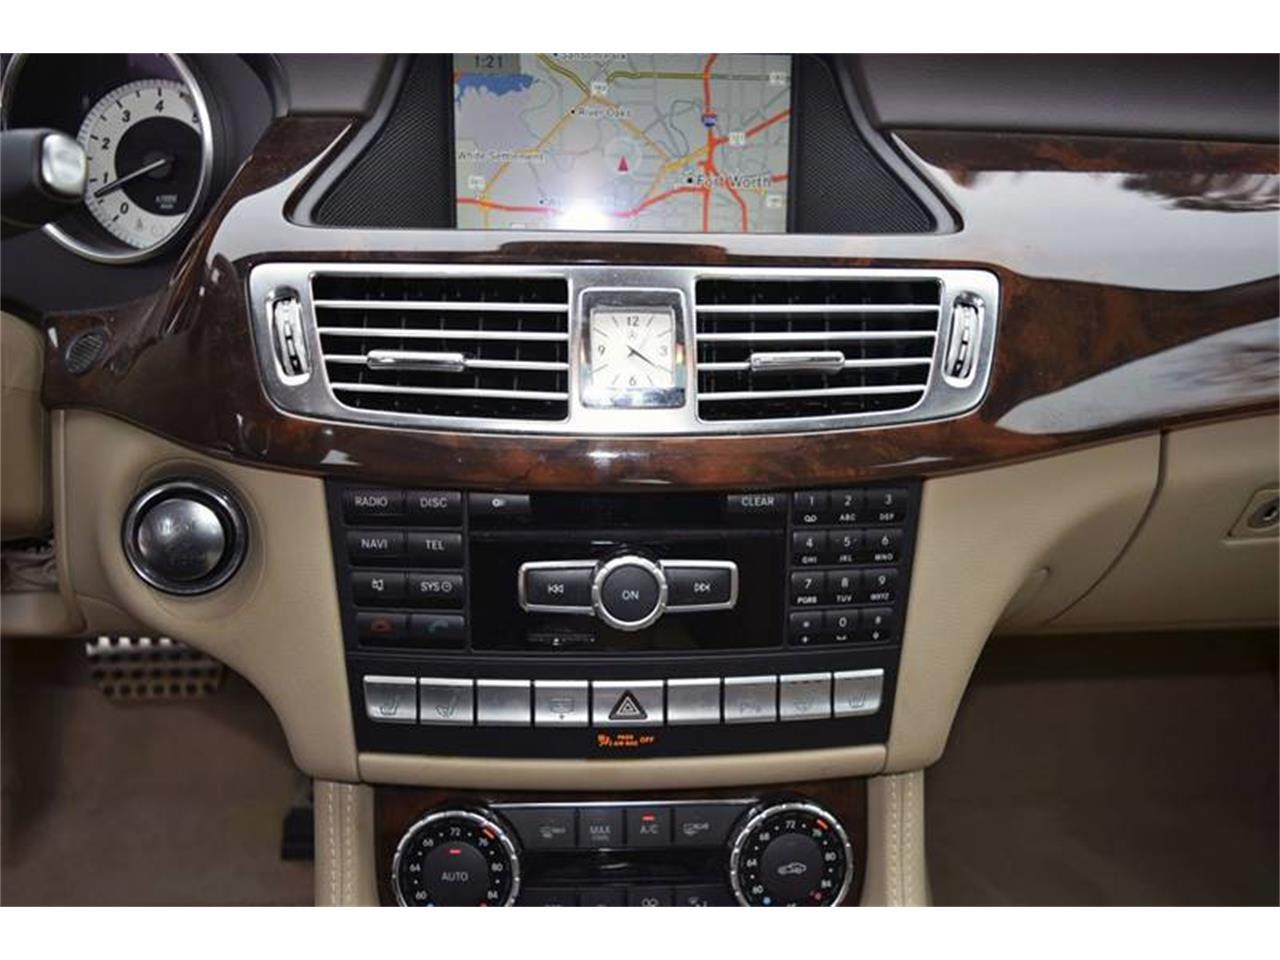 2013 Mercedes-Benz CLS-Class for Sale | ClassicCars.com ...